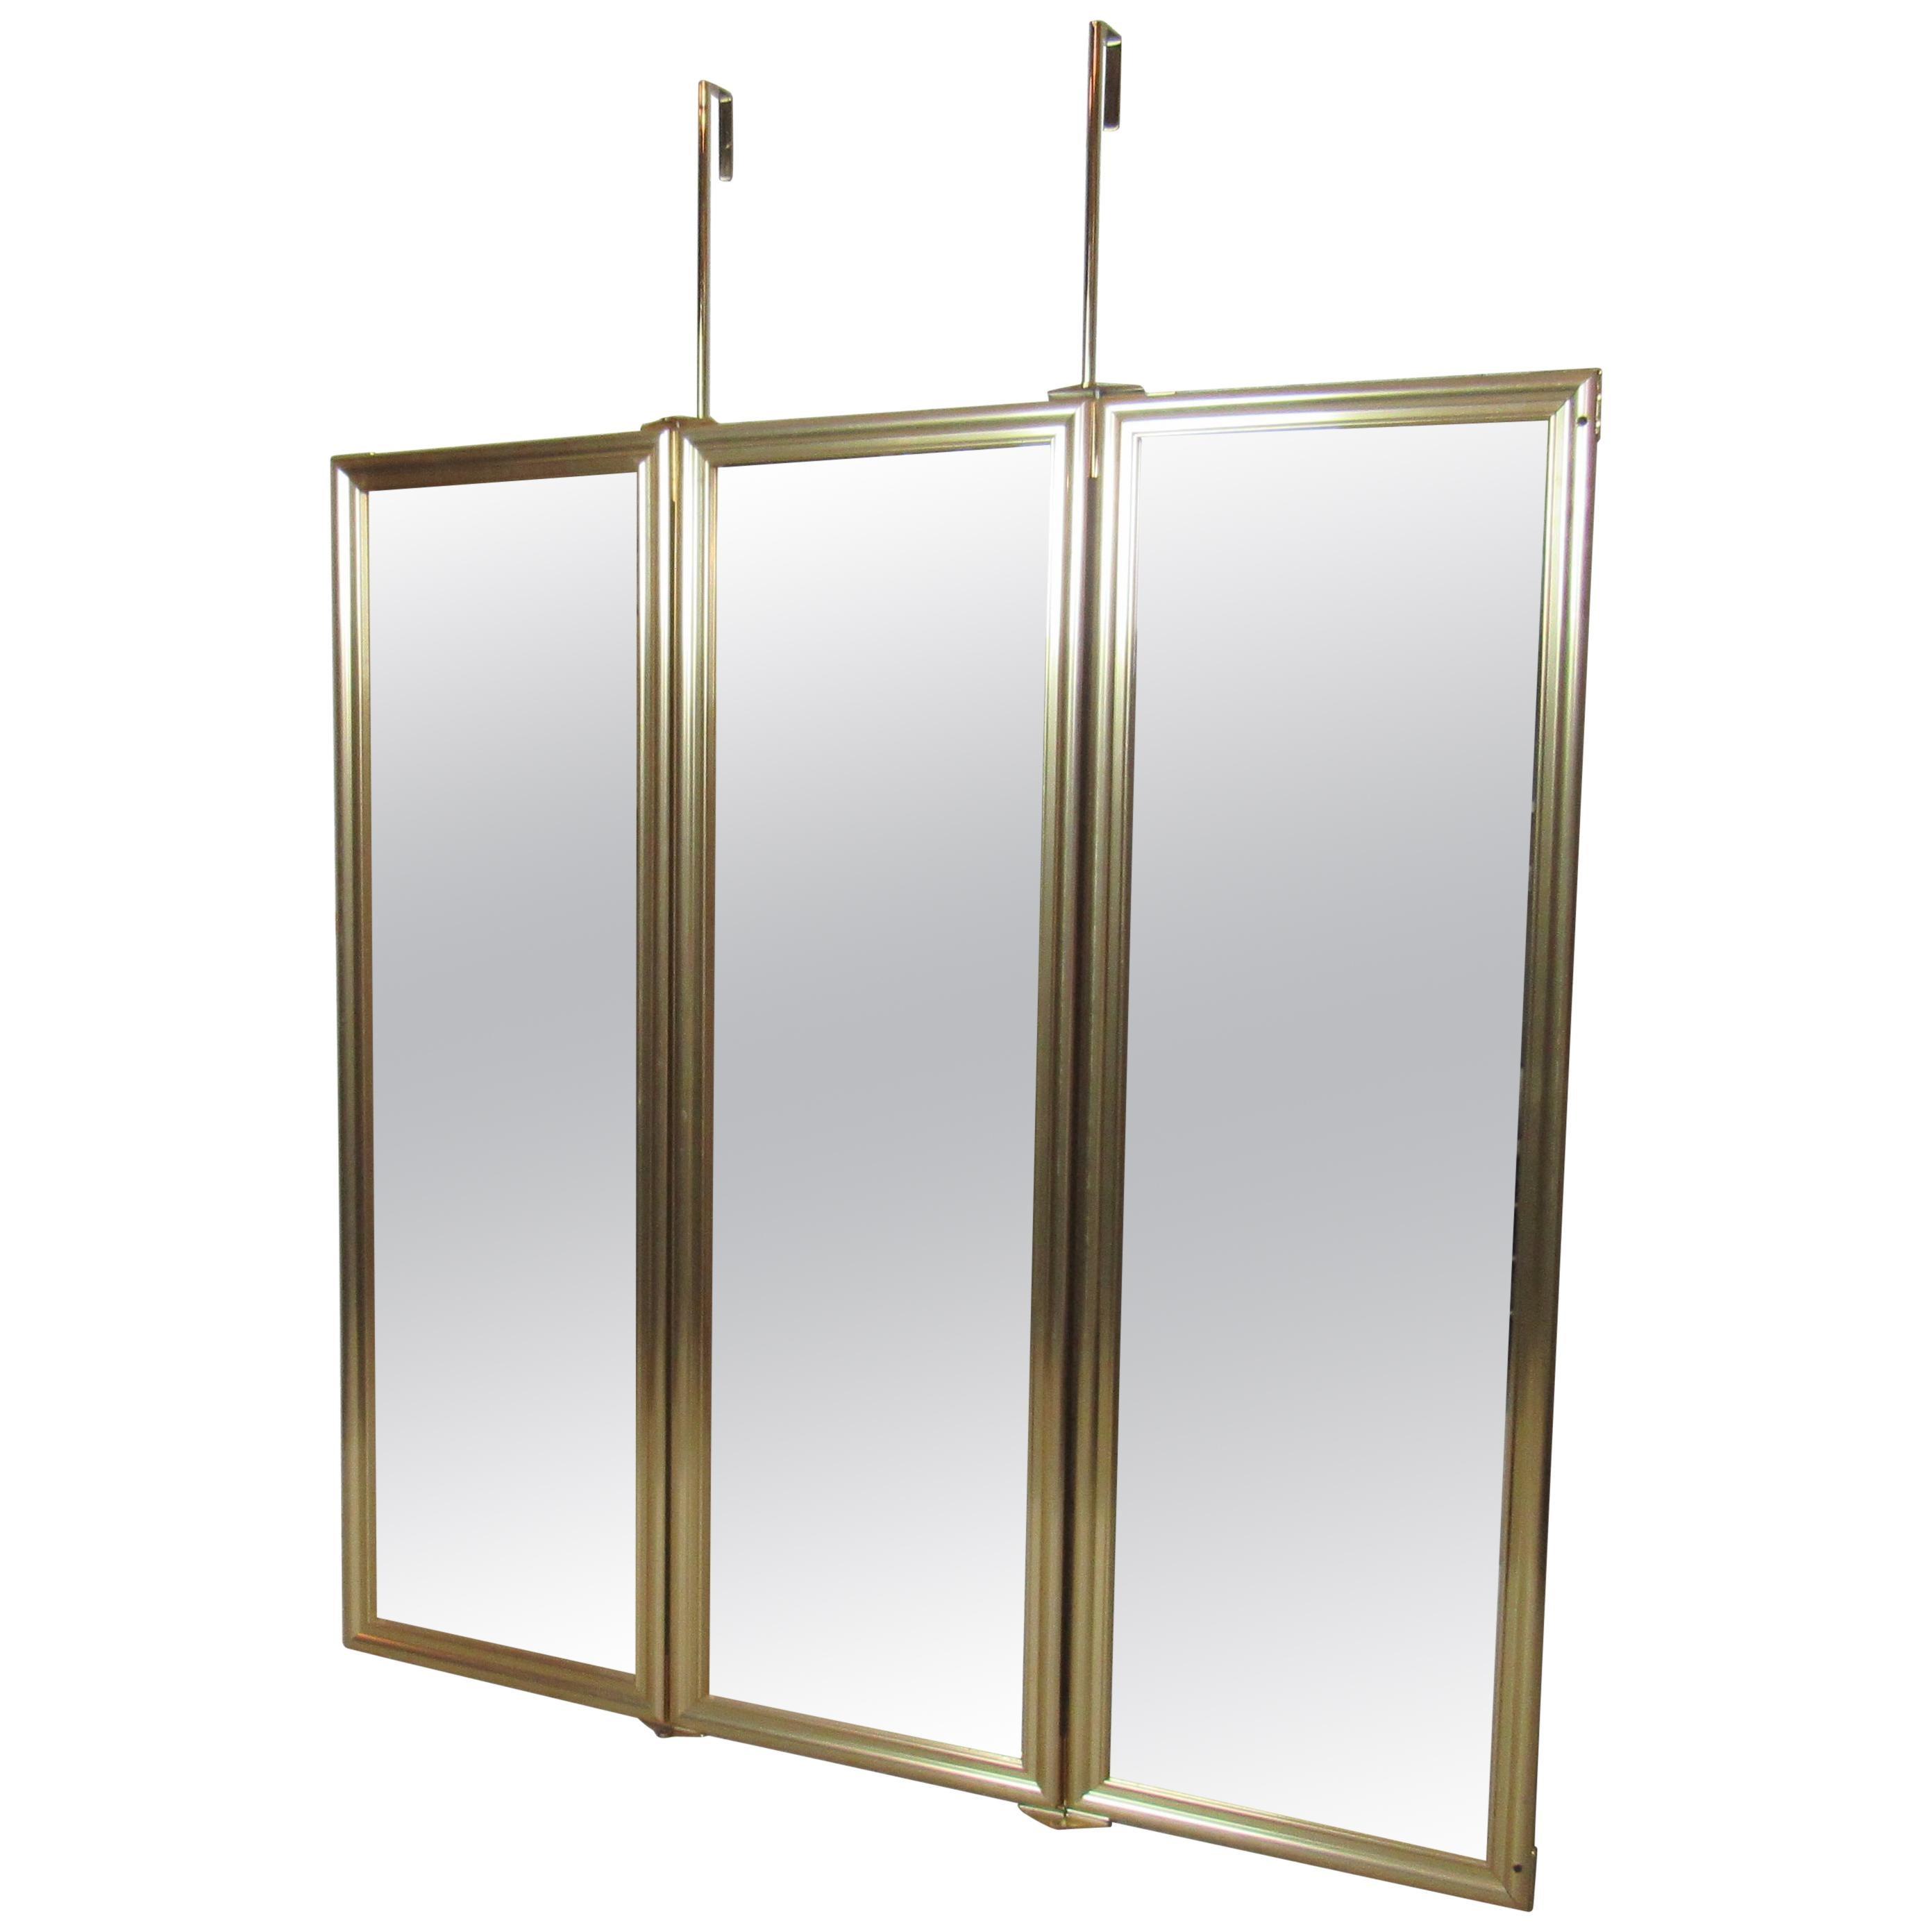 Three-Panel Hanging Mirror